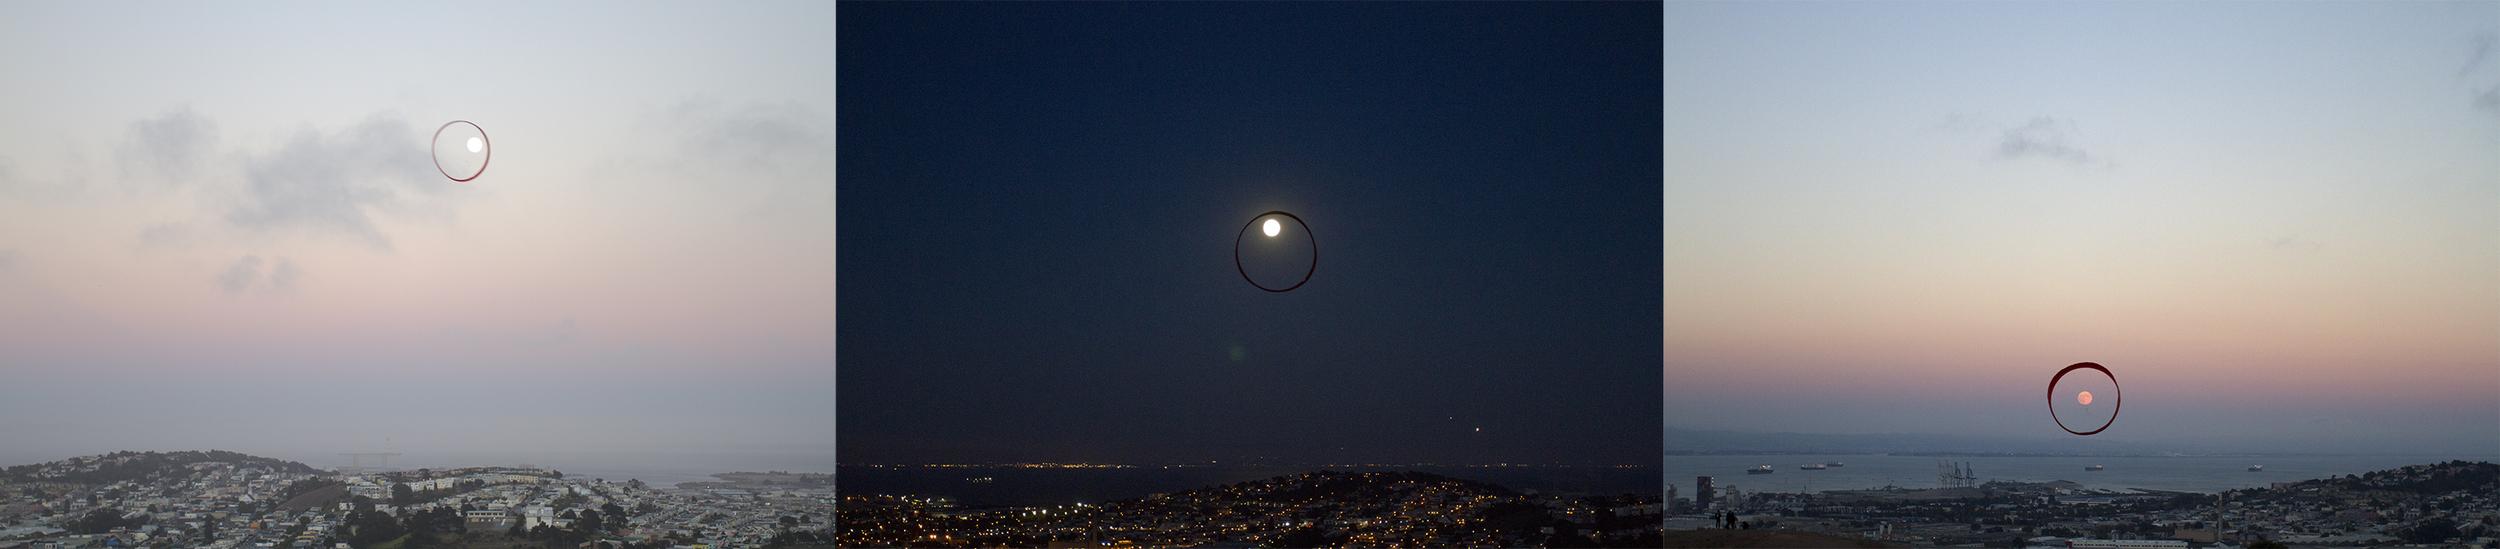 Three Full Moons, 2012-2014, Three Digital C-prints on Di-bond, 20 in x 13.5 in each, edition of 3,